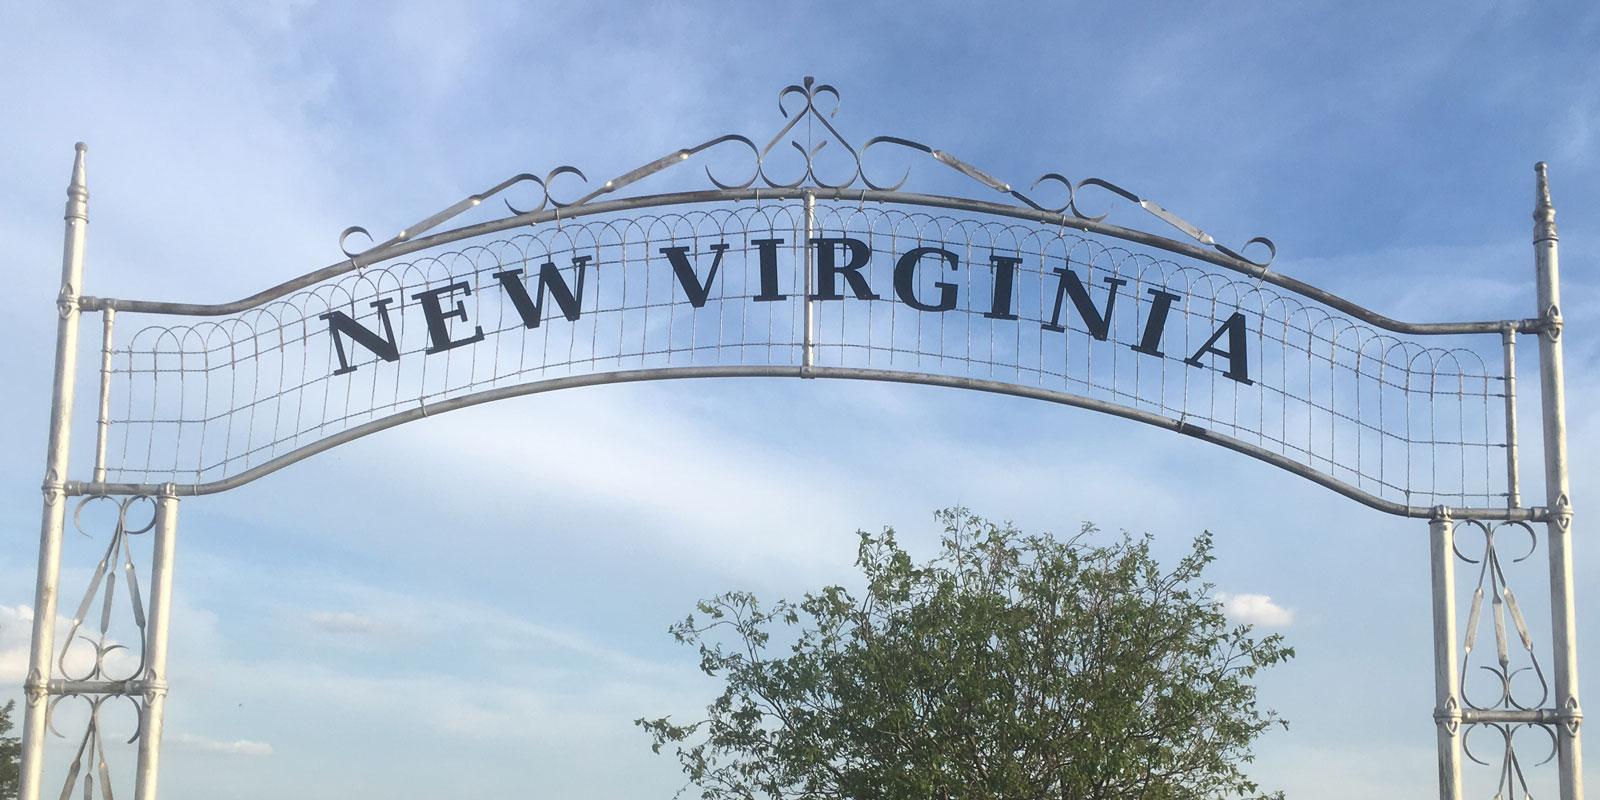 New Virginia